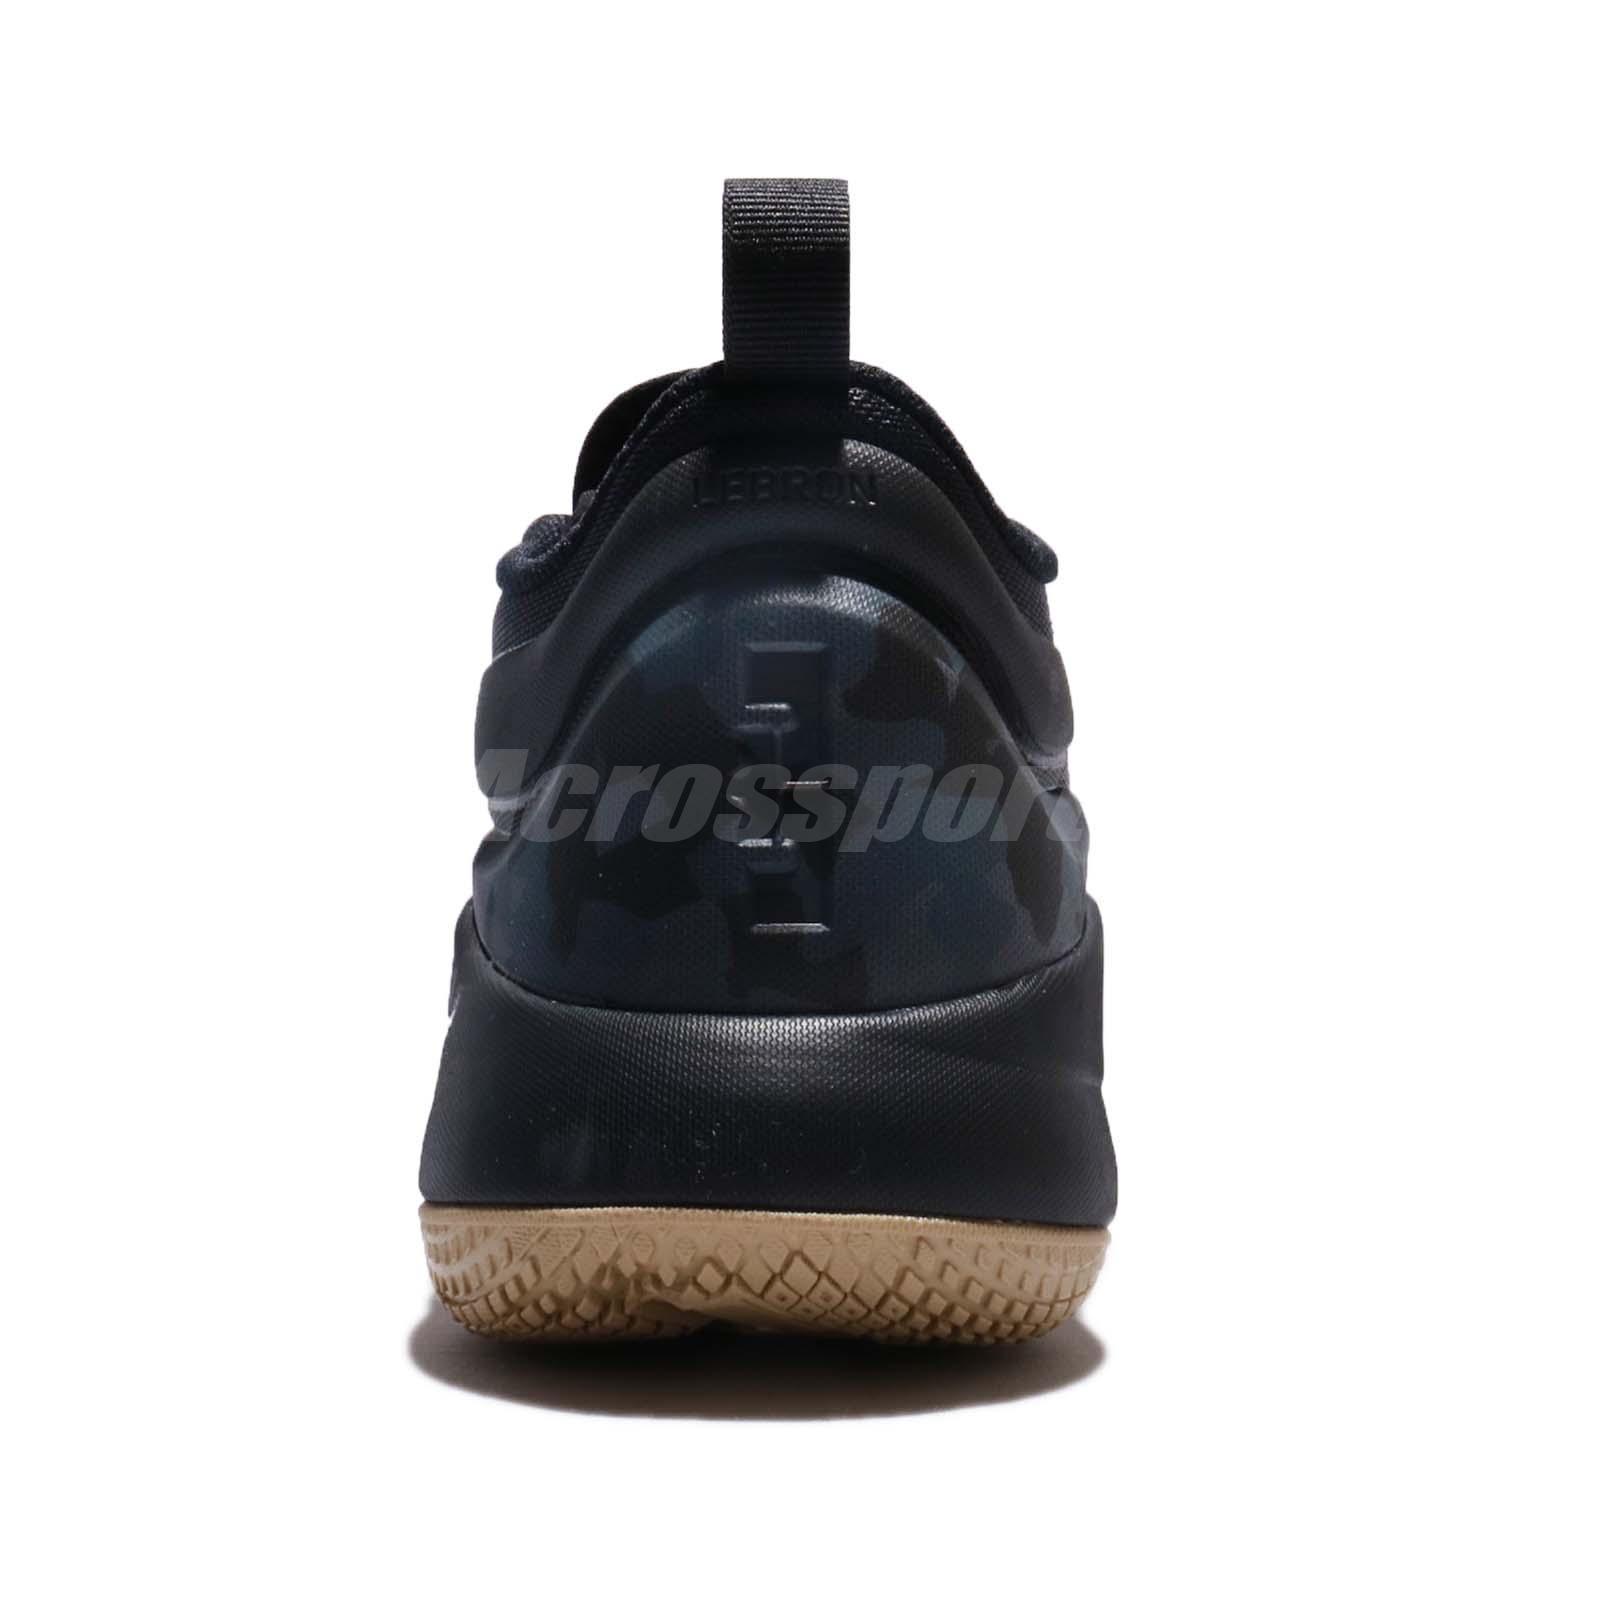 338df3c0f133b Nike Lebron Witness II EP 2 James Black Men Basketball Shoes ...